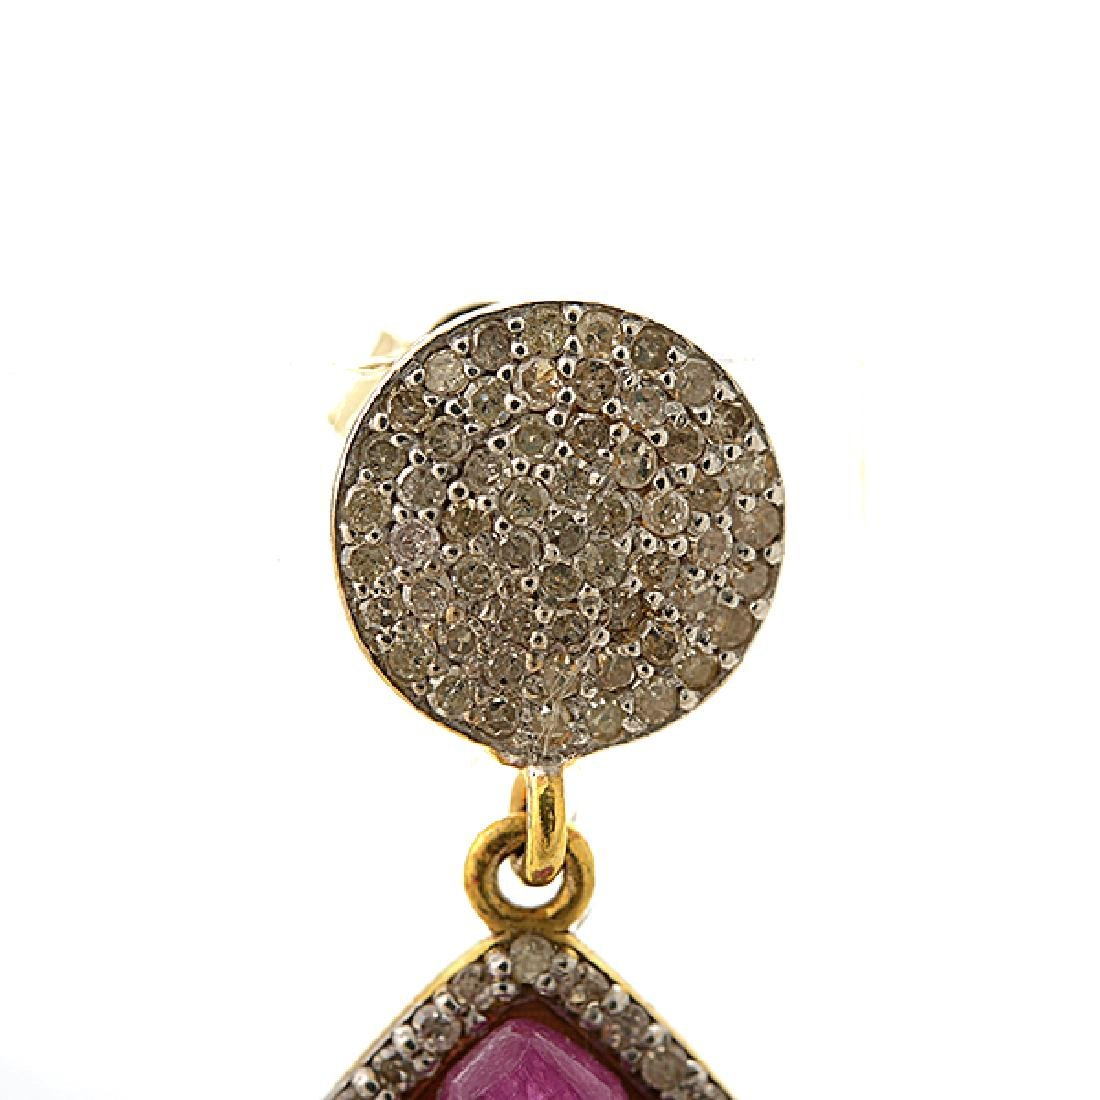 Pair of Ruby, Diamond, 14k Yellow Gold Earrings. - 2